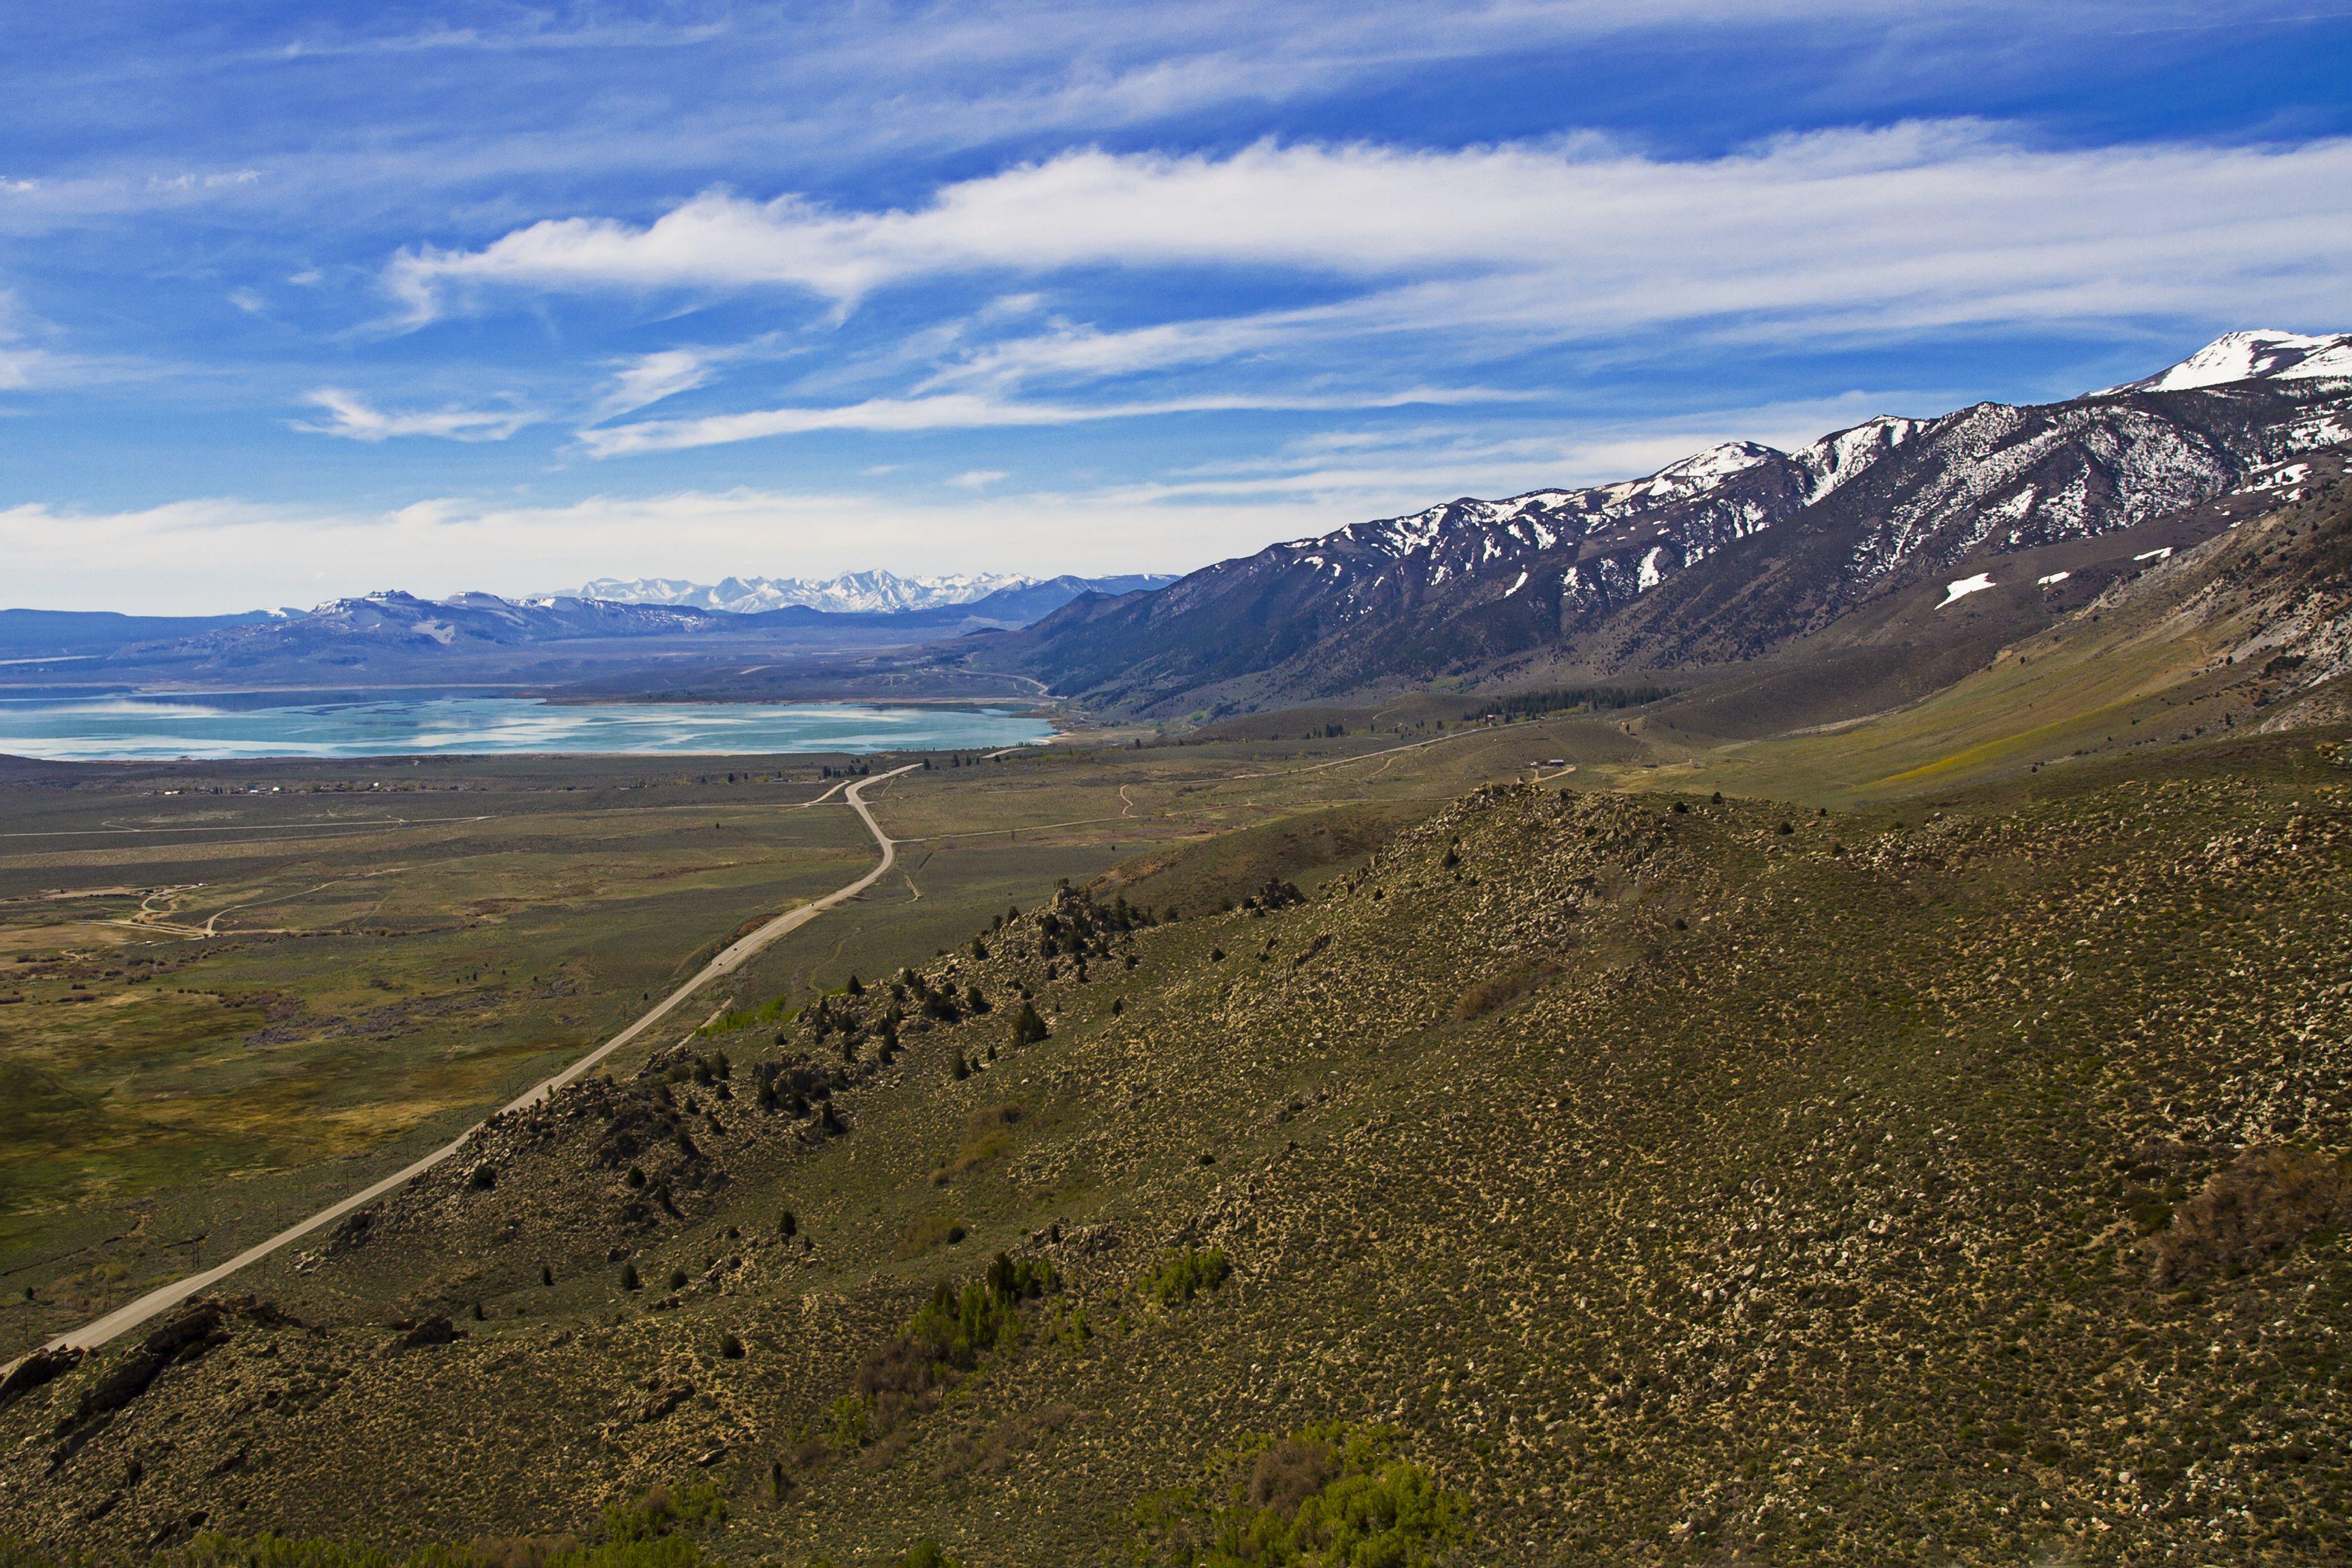 Eastern Slopes of Sierra Nevada Mountains